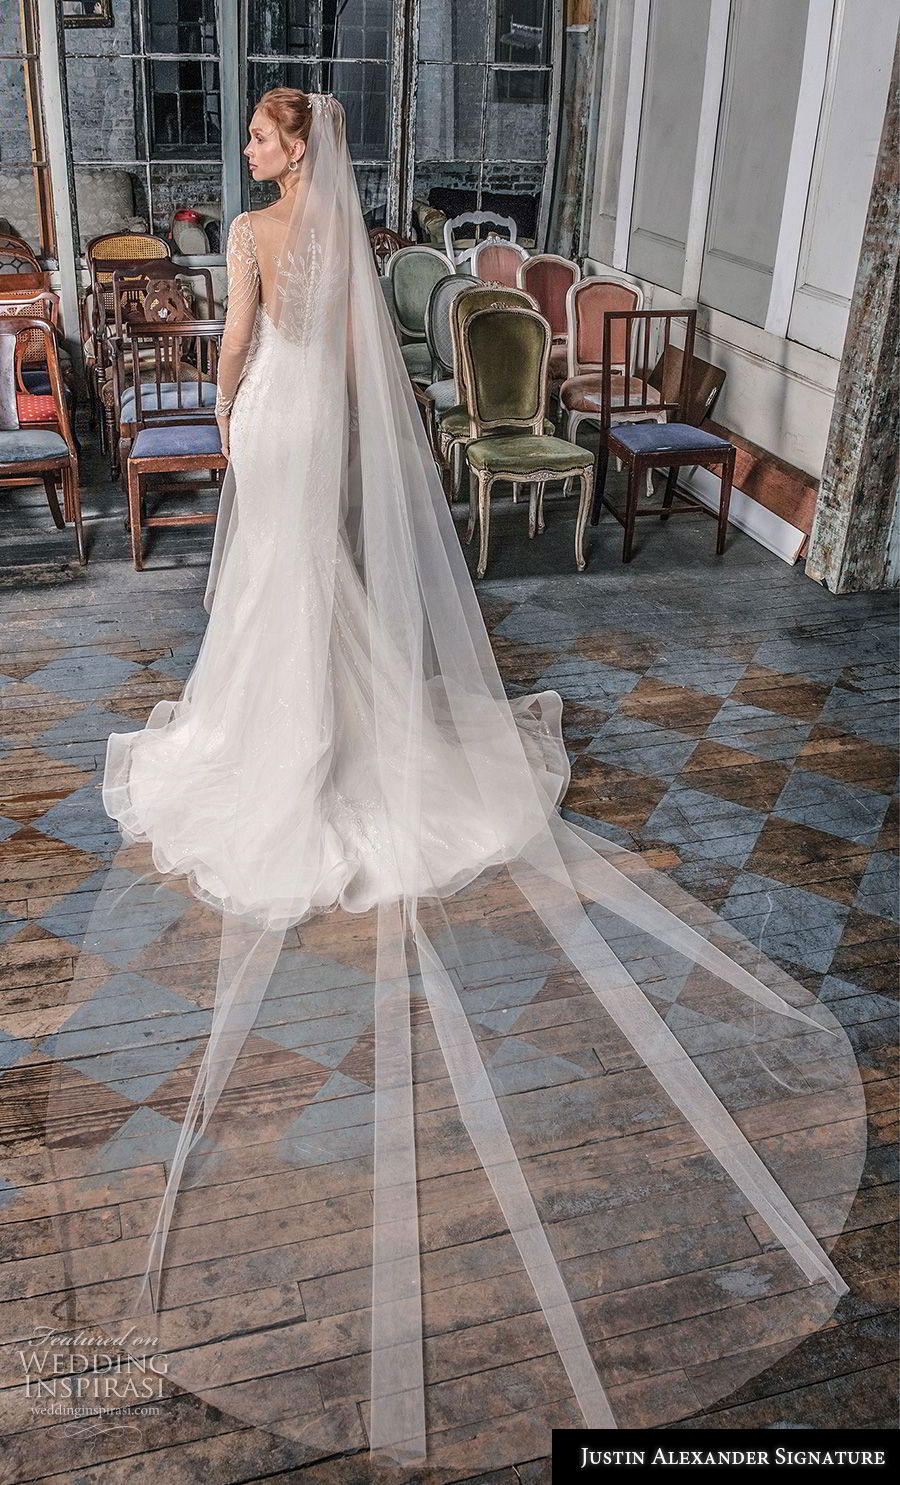 justin alexander fall 2018 signature long sleeves illusion bateau sweetheart neckline full embellishment glitzy elegant fit and flare wedding dress sheer lace back sweep train (7) bv